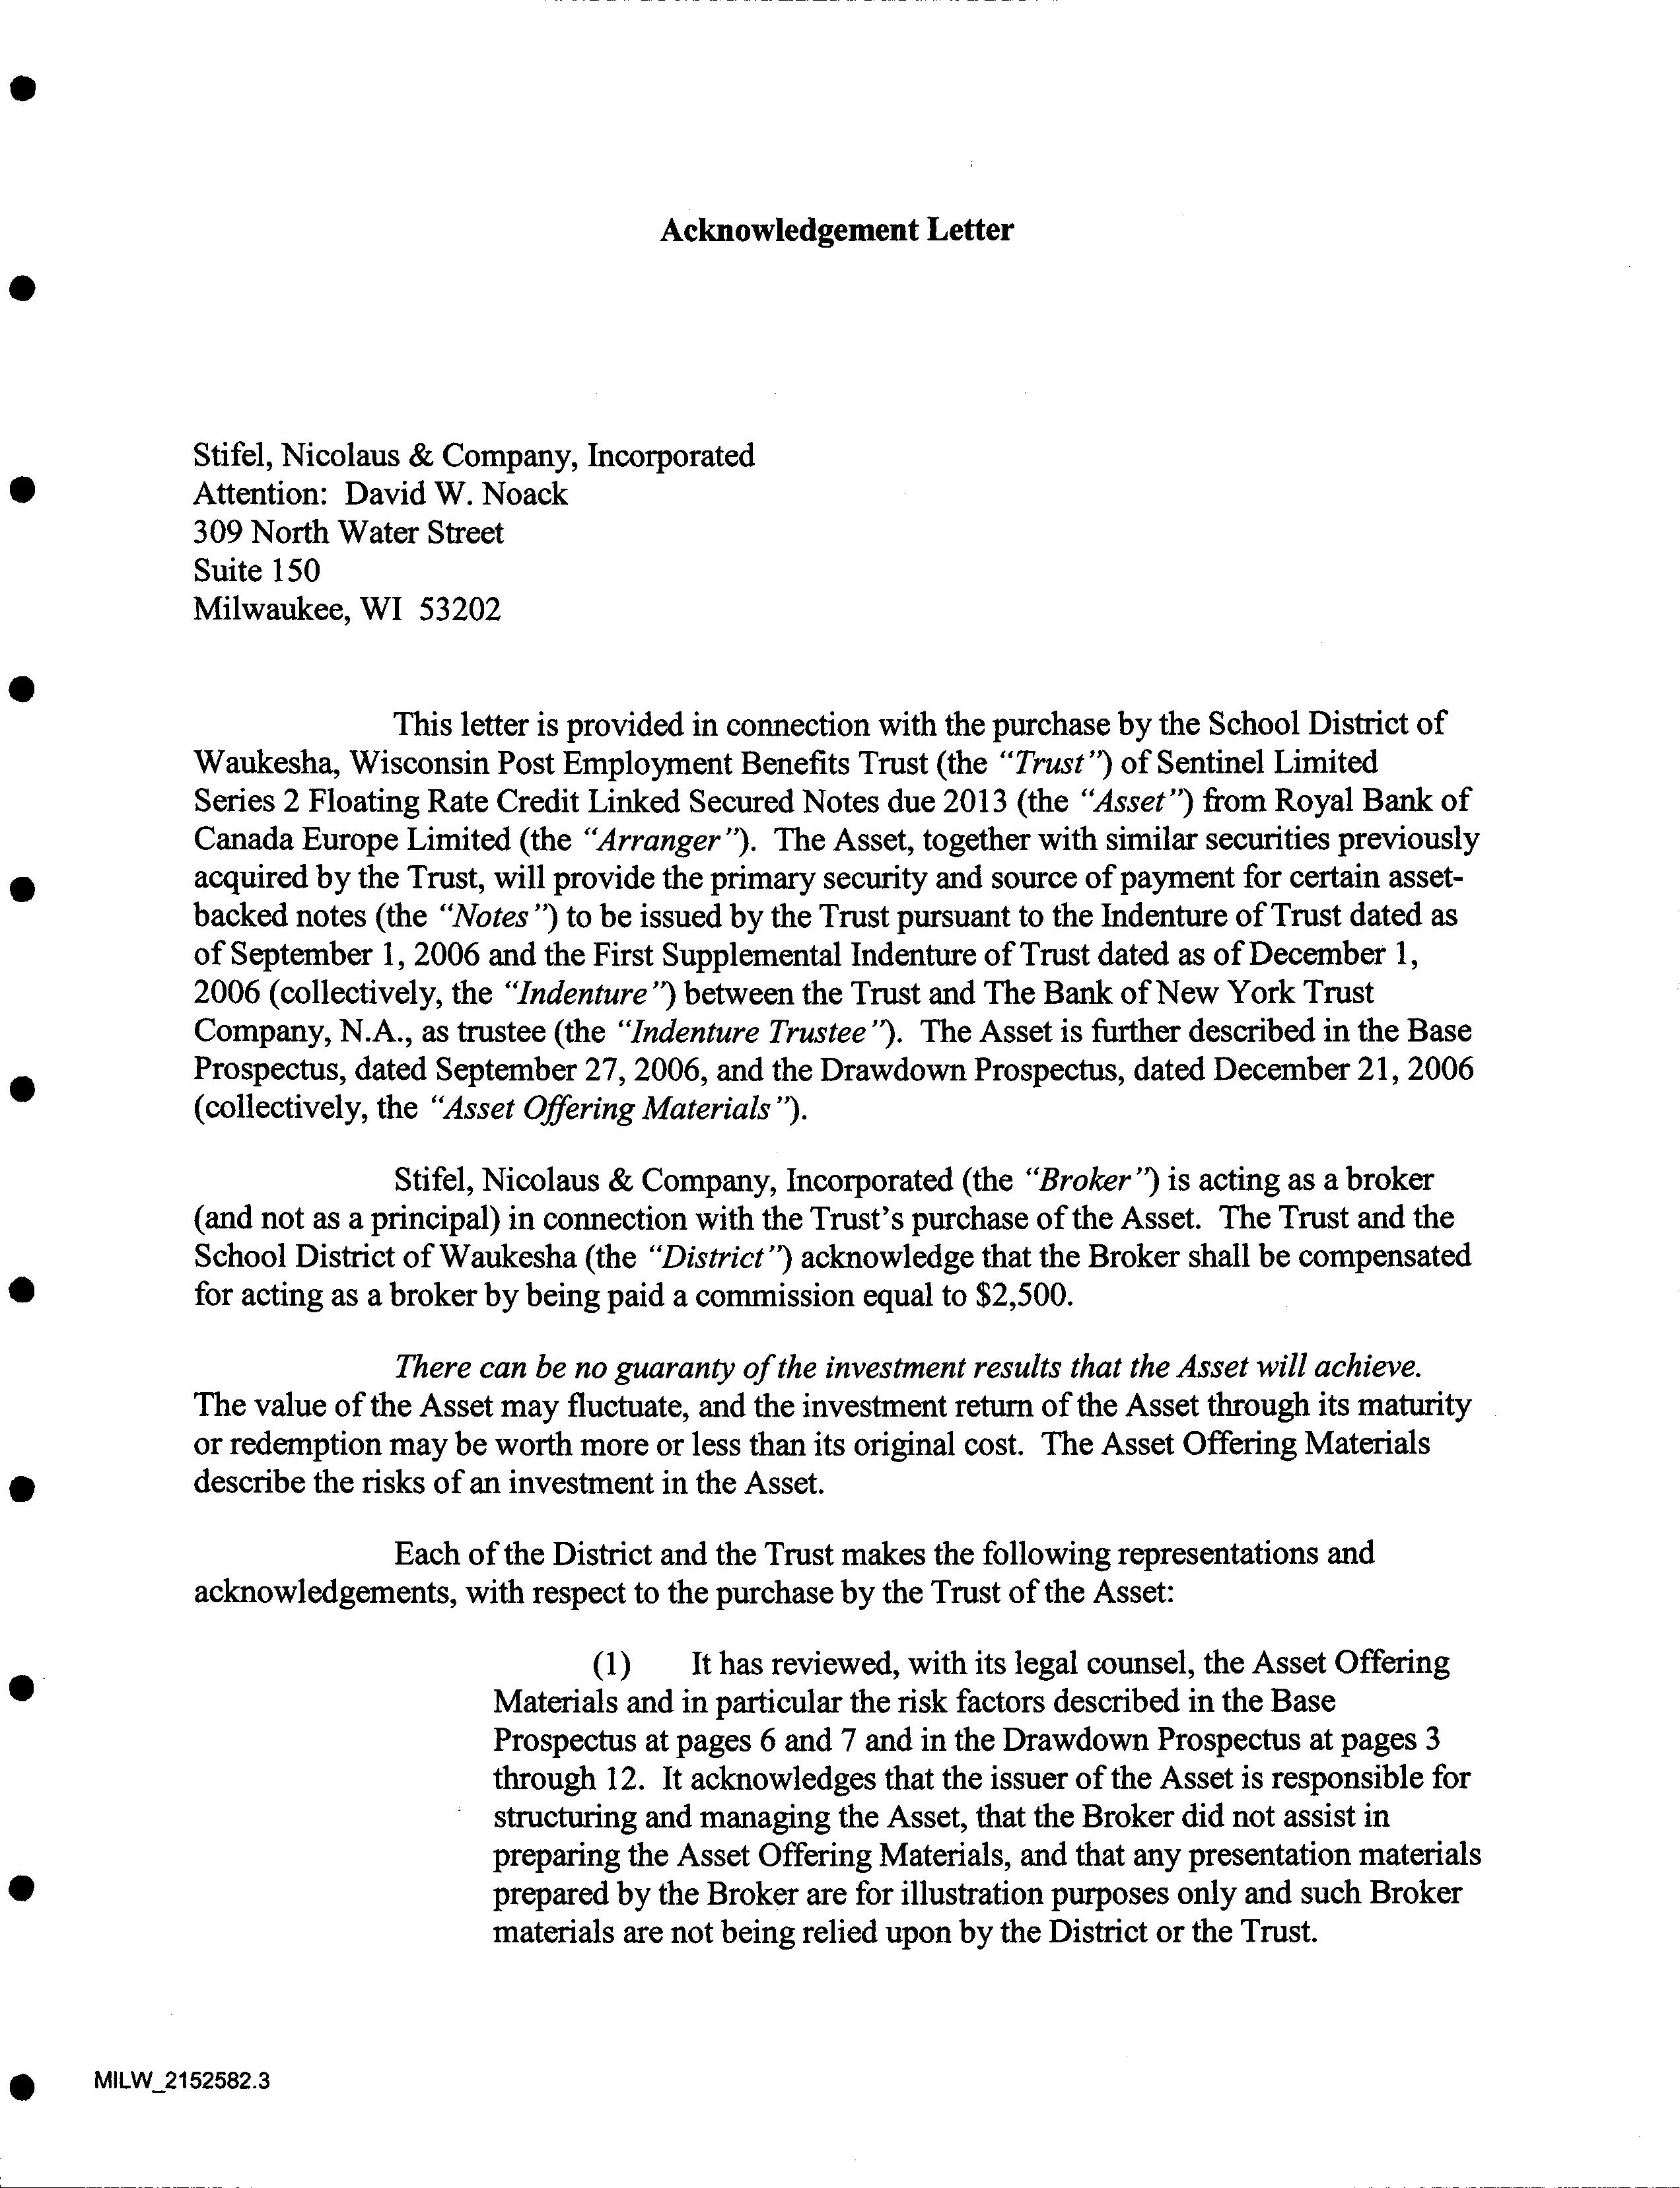 company asset acknowledgement letter